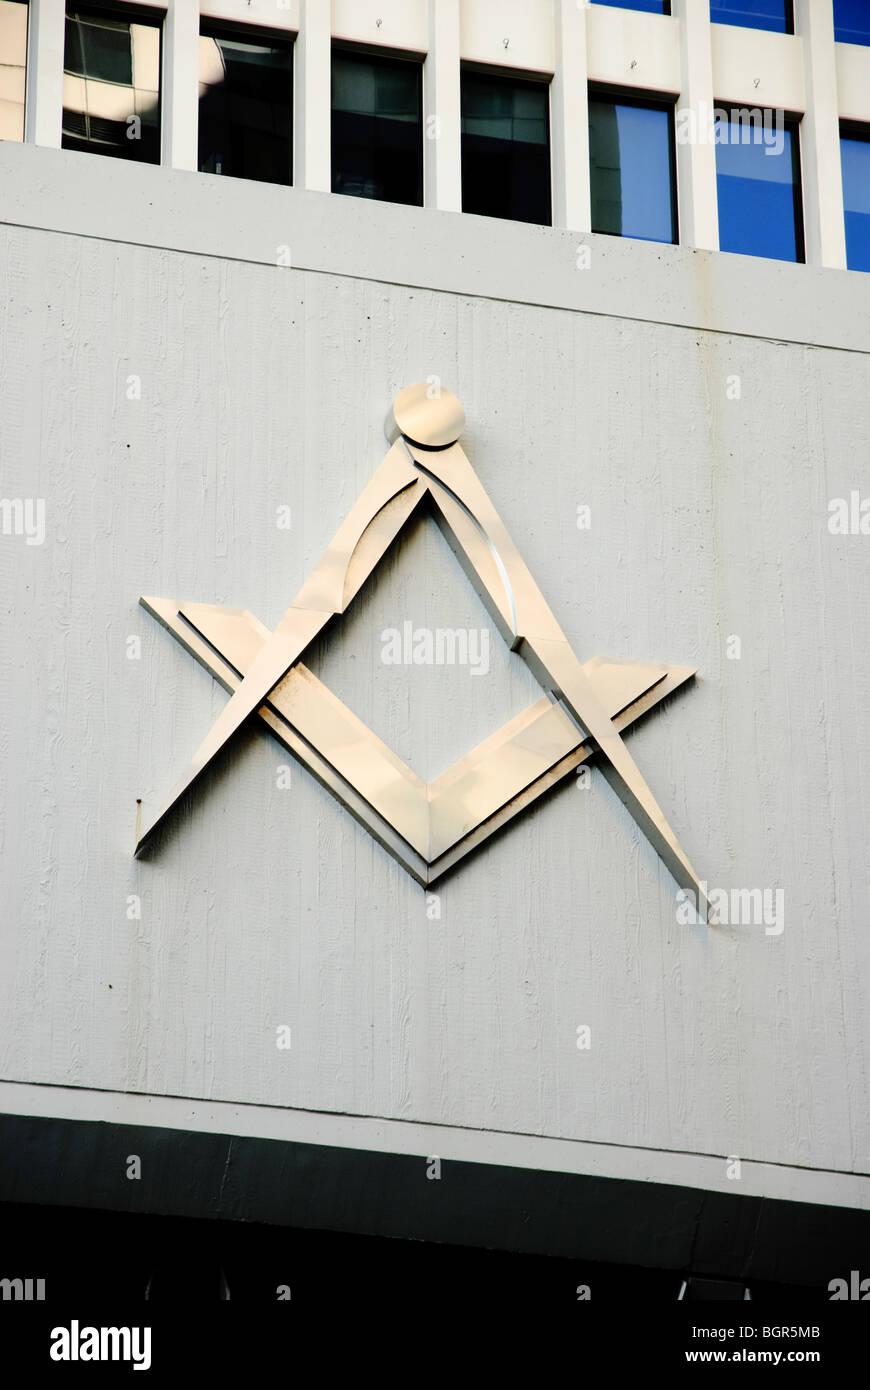 Masonic symbol. Freemason symbol. Freemasonry. Masonic compass. - Stock Image